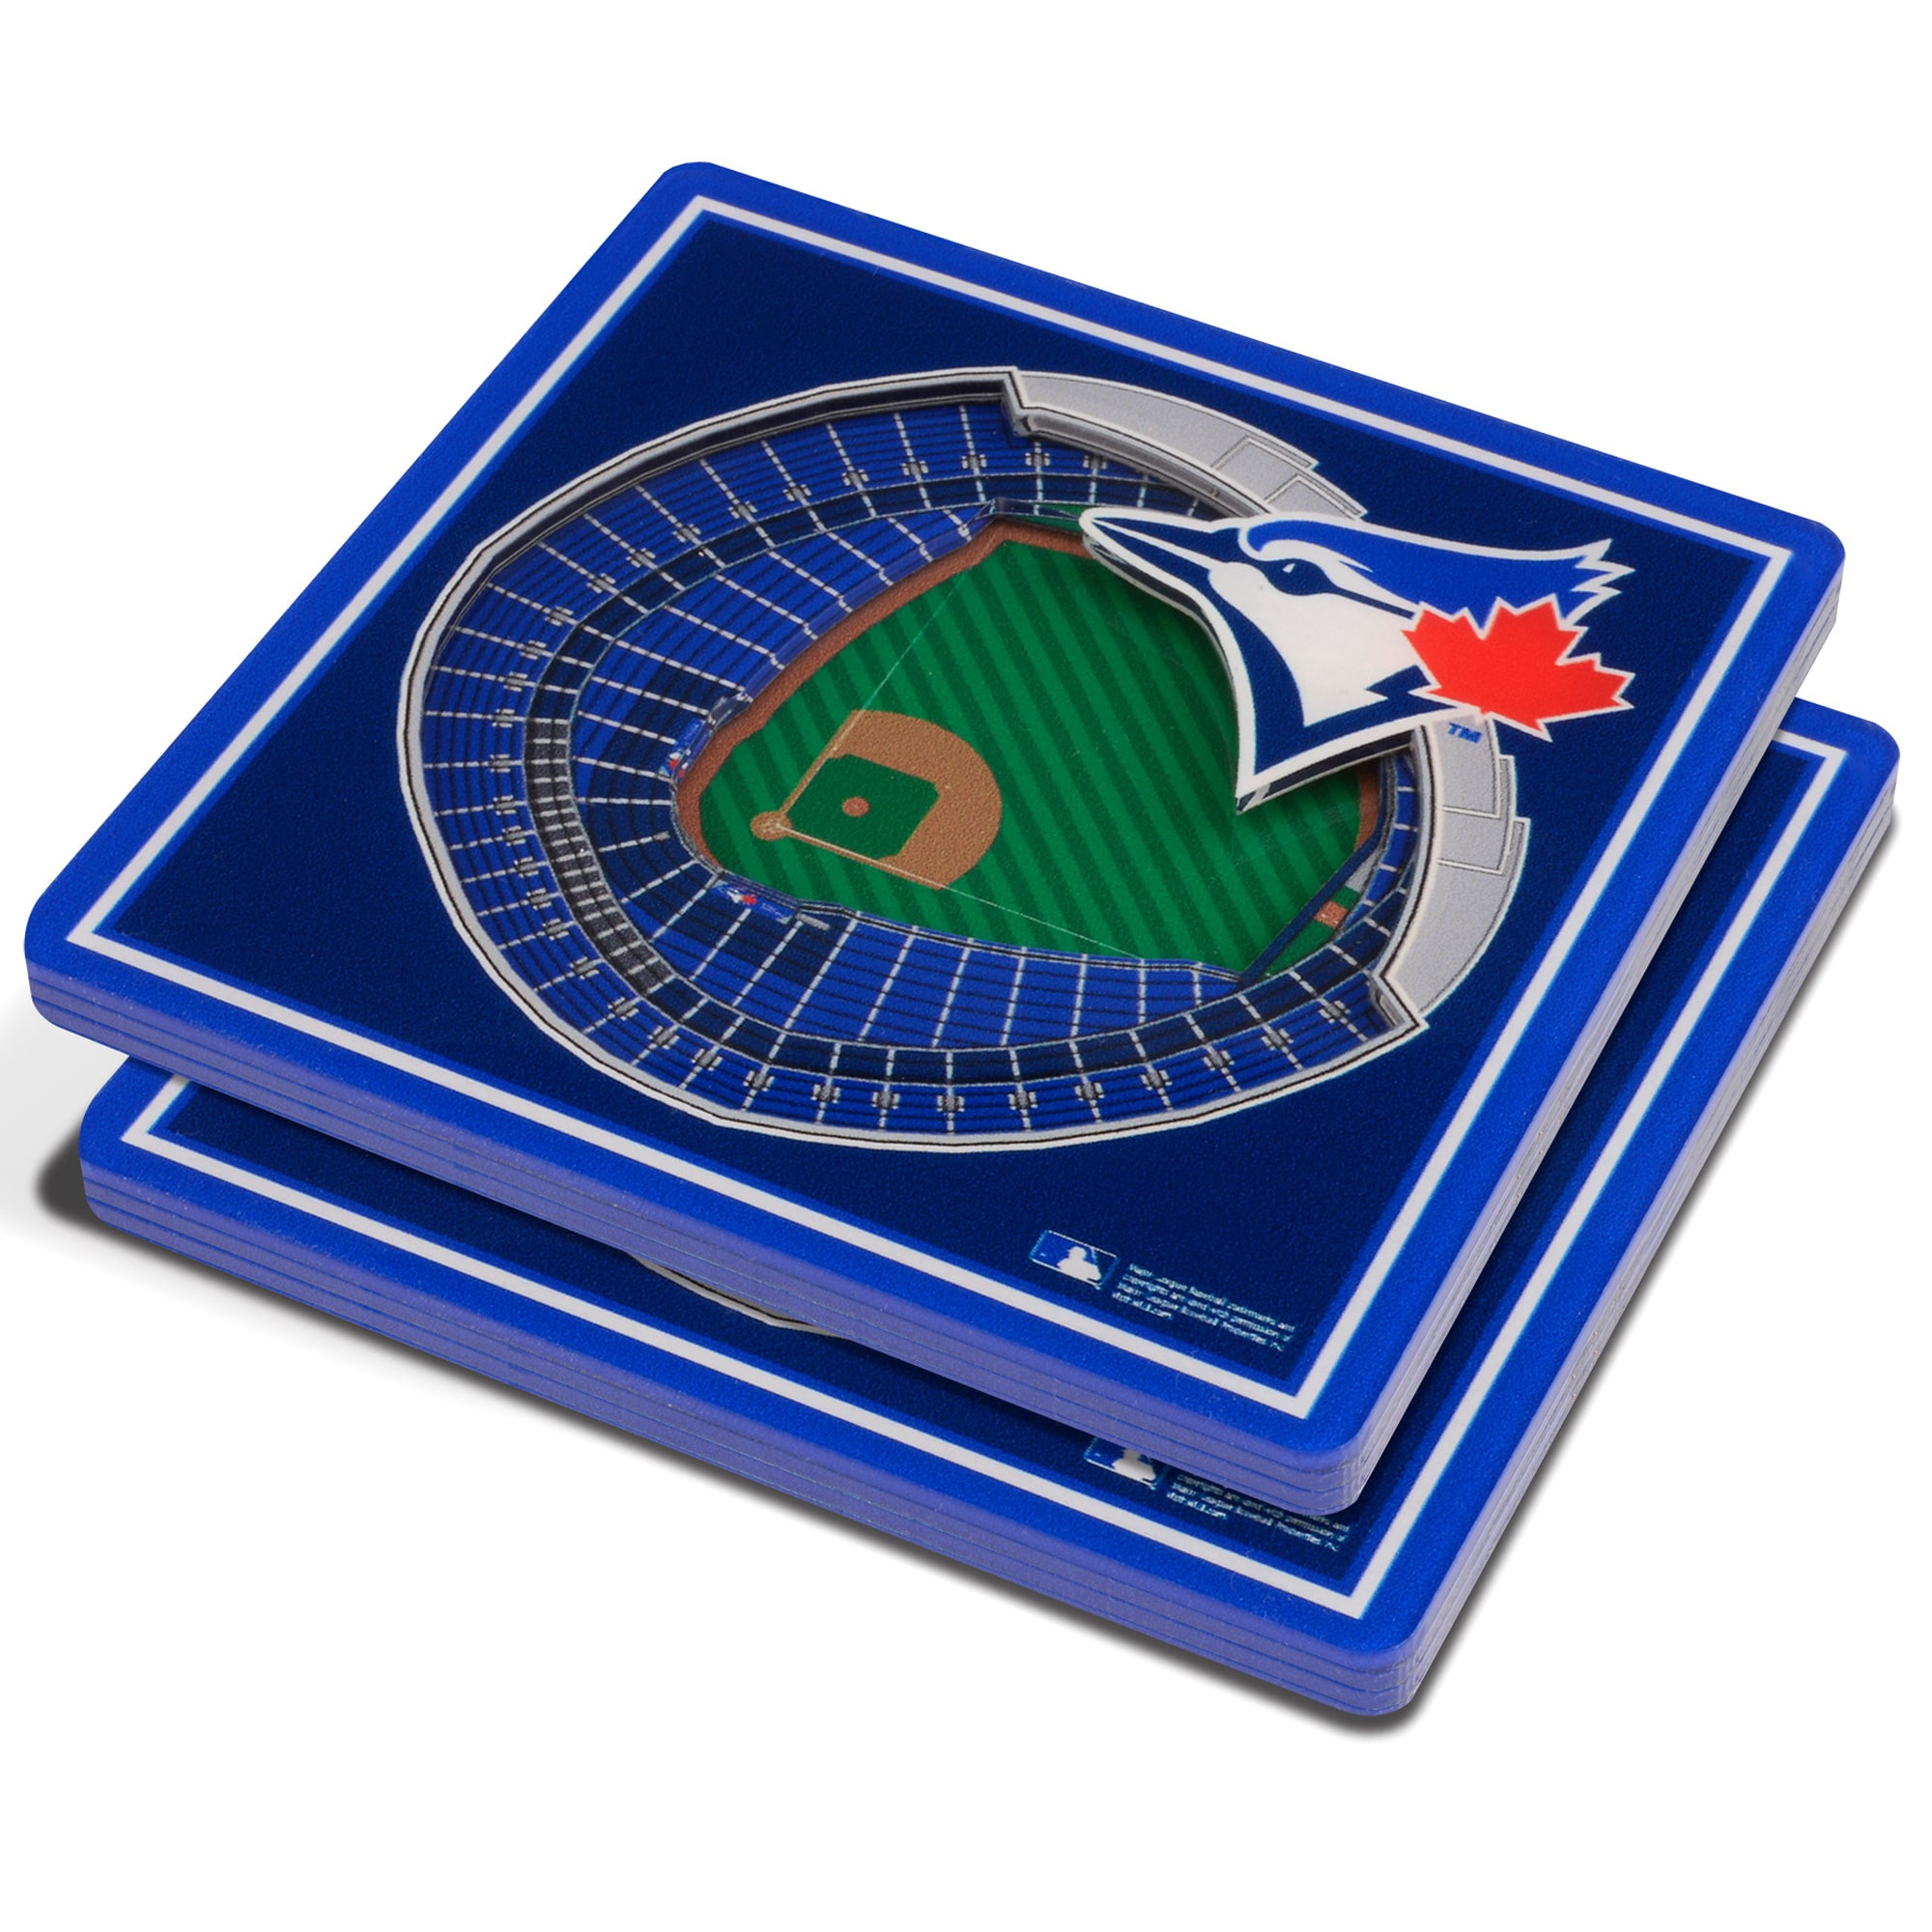 Toronto Blue Jays 3D StadiumViews Coasters - Blue